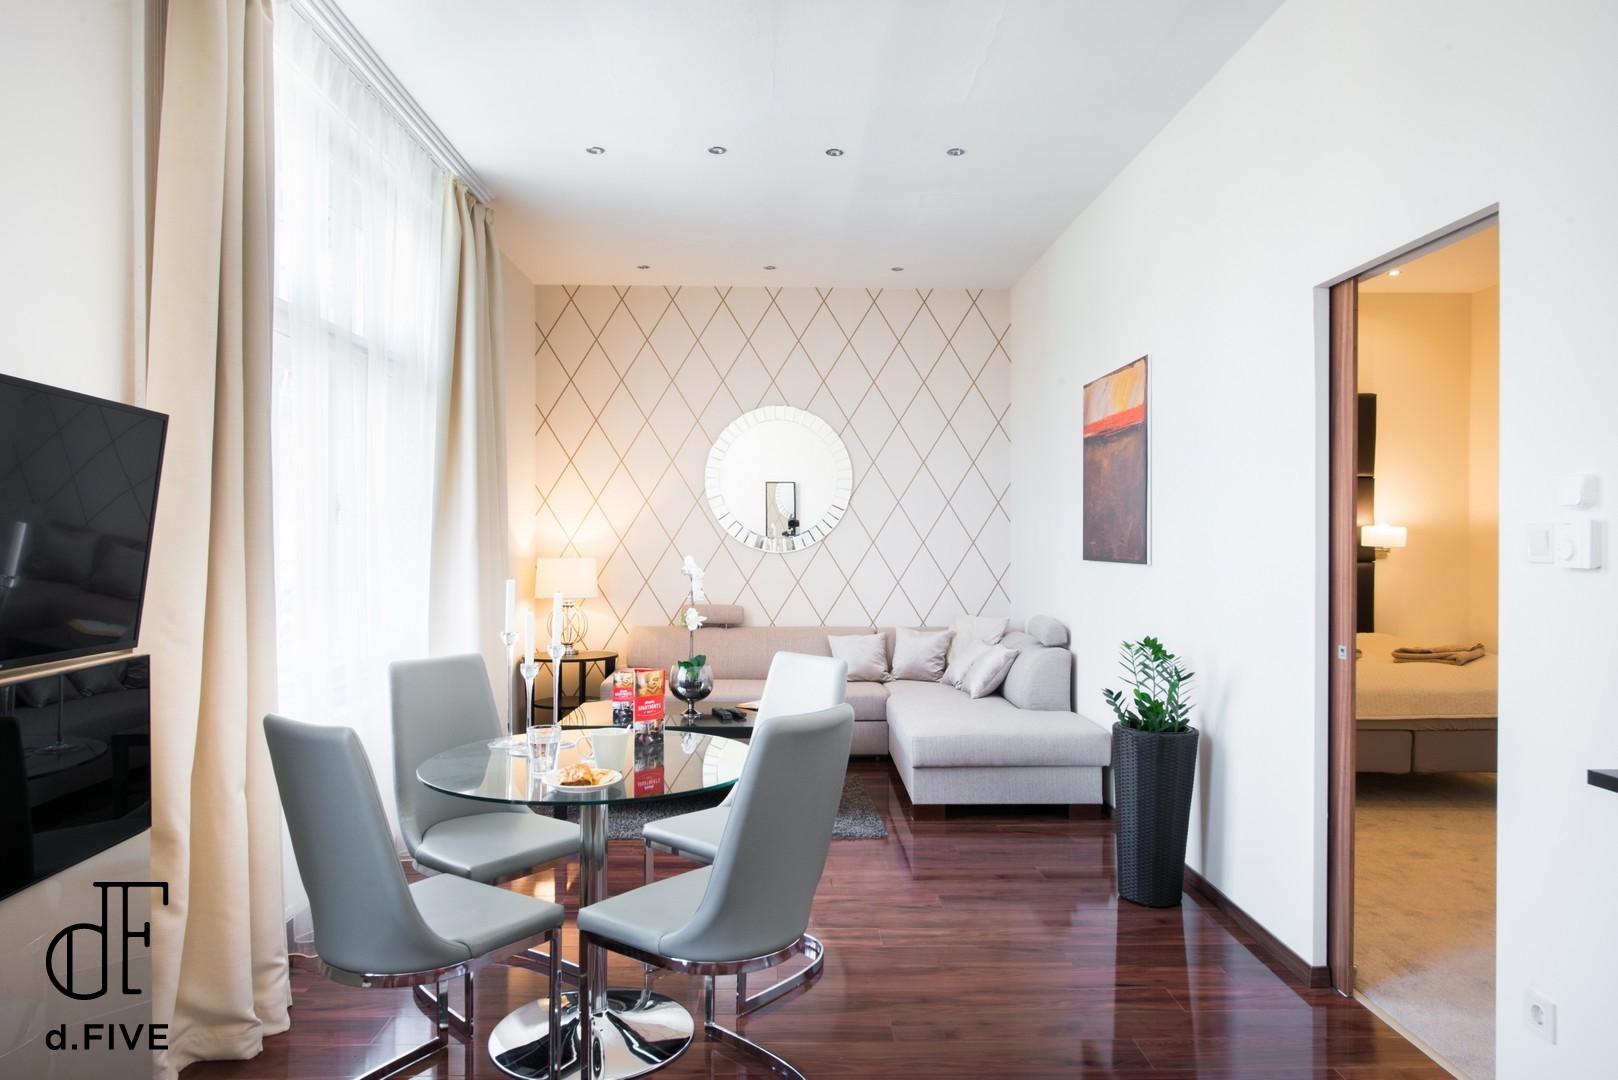 d.FIVE Executive apartment